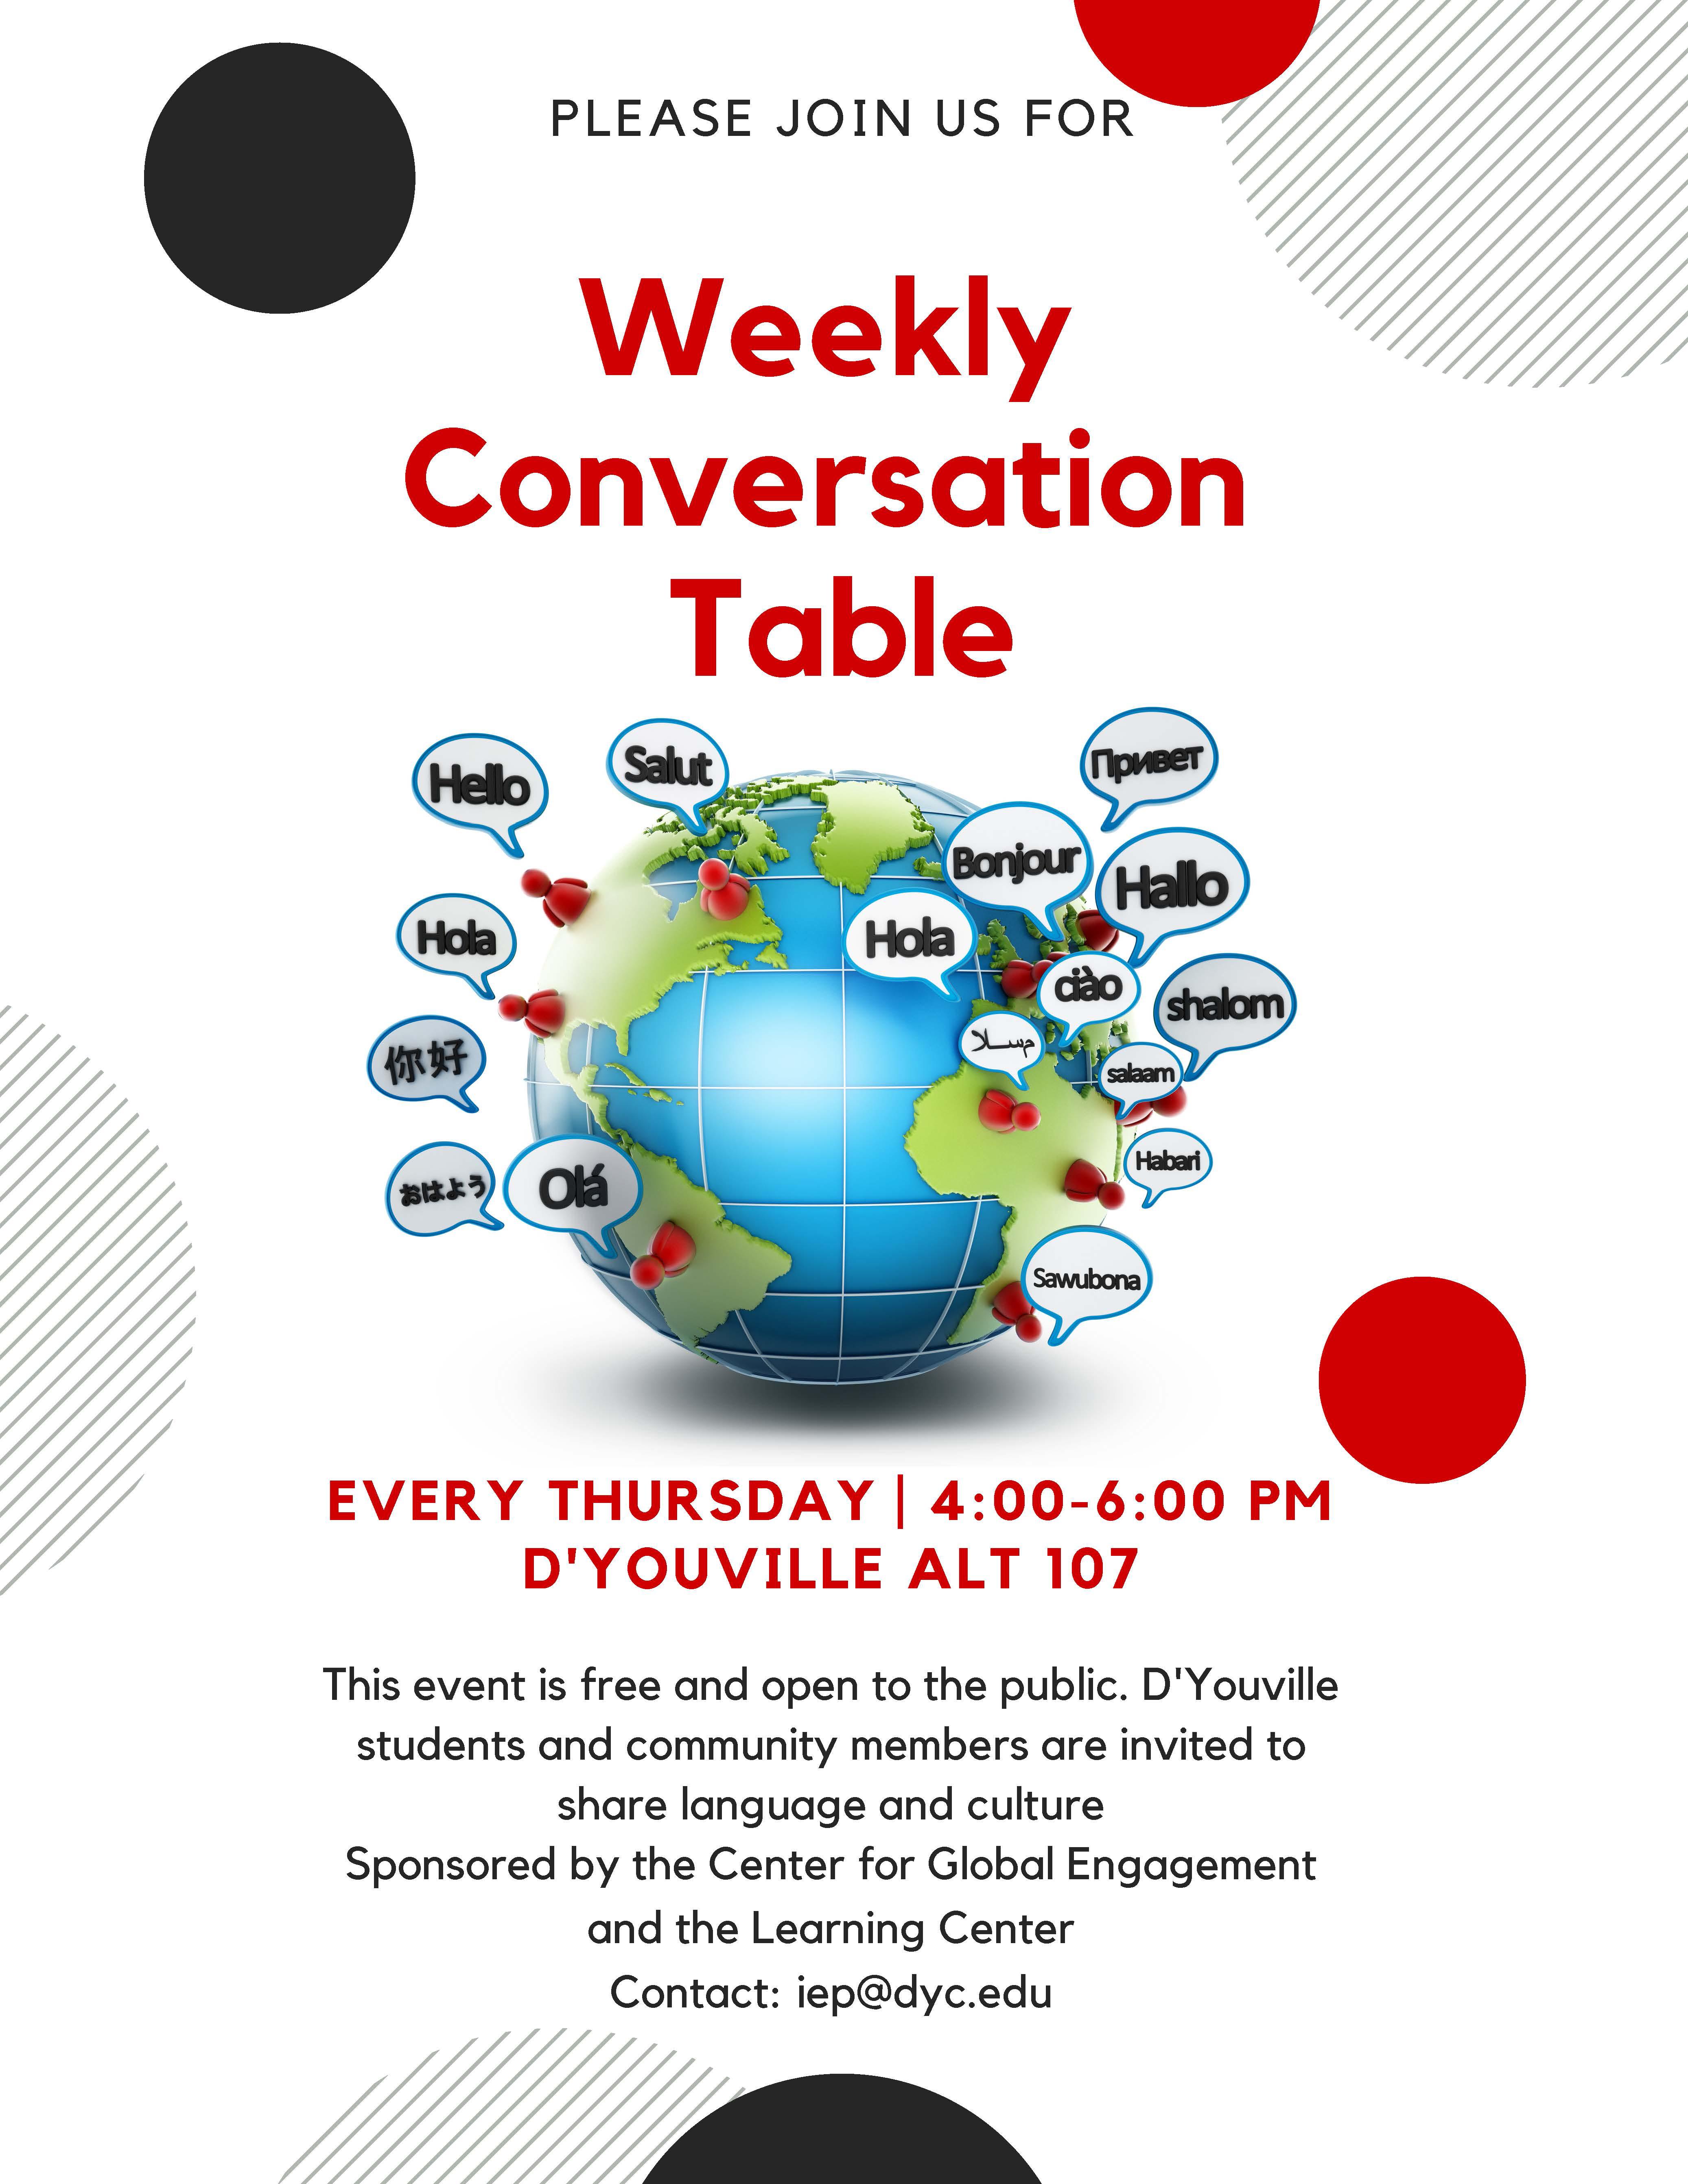 D'youville Events Calendar – Weekly Conversation Table D'youville Calendar 2019